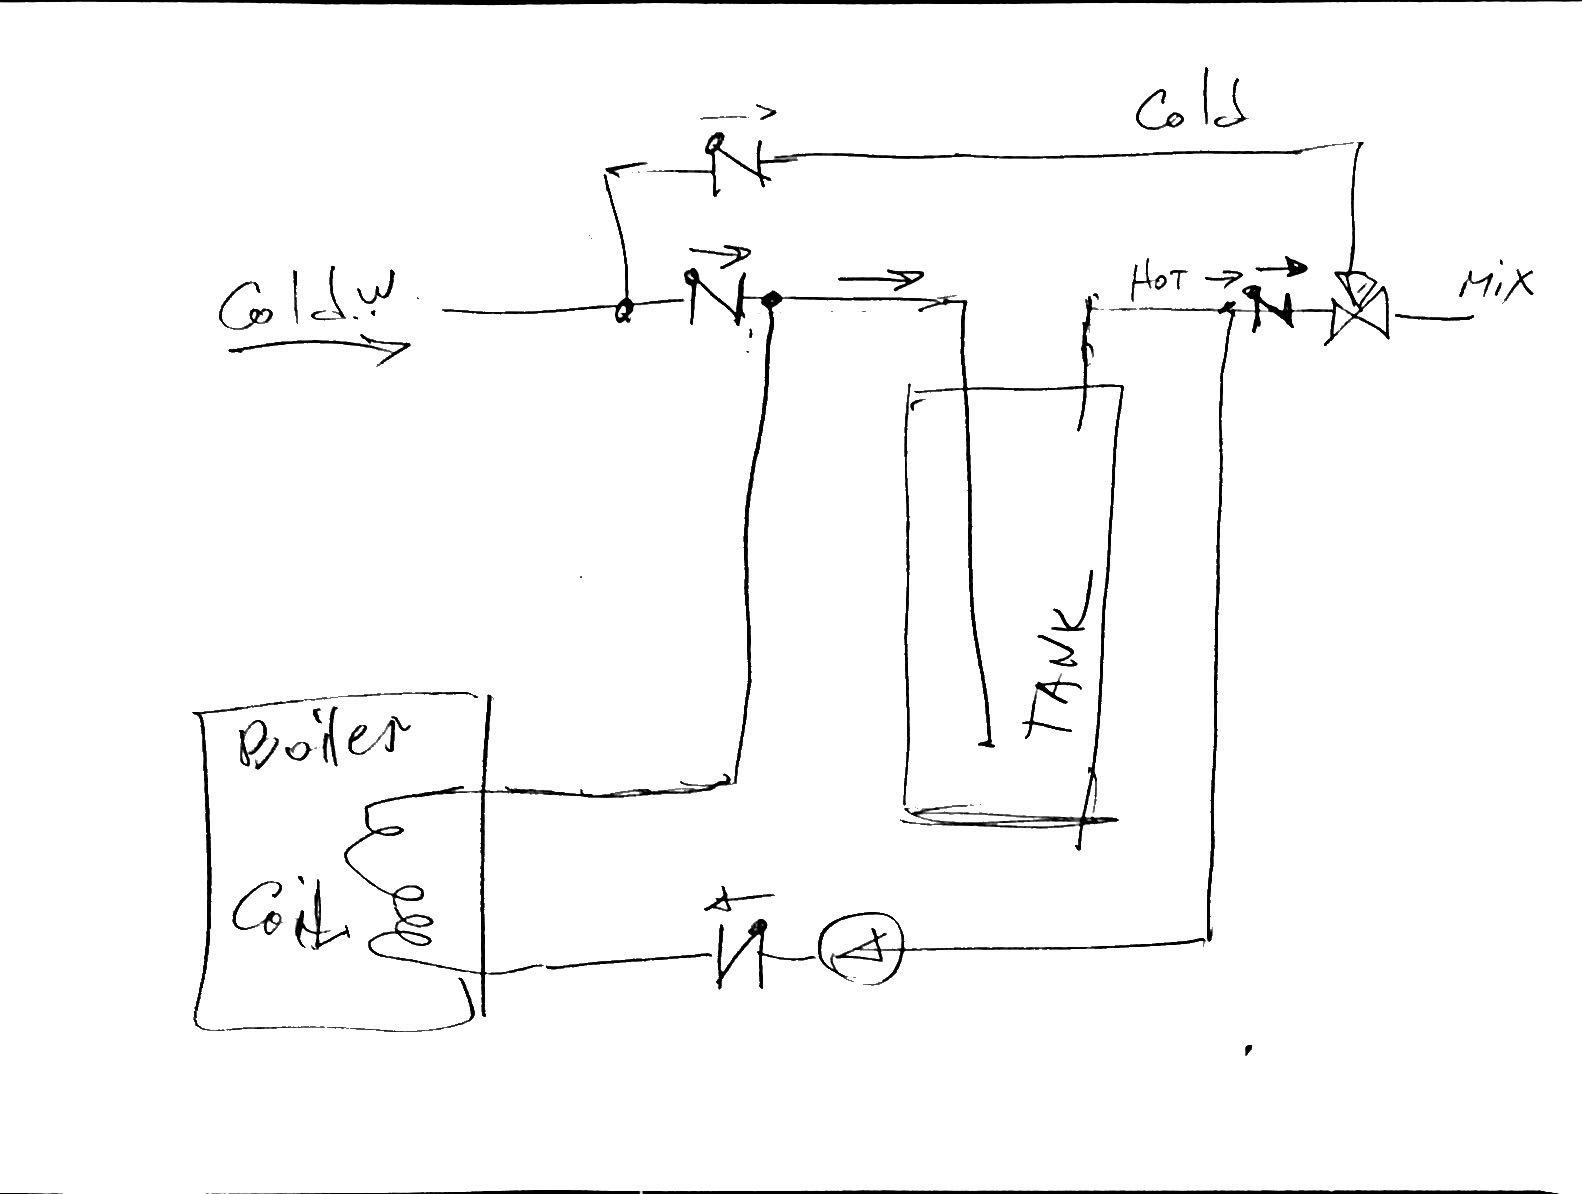 taco sentry zone valve wiring diagram john deere 425 lawn tractor 555 24 volt